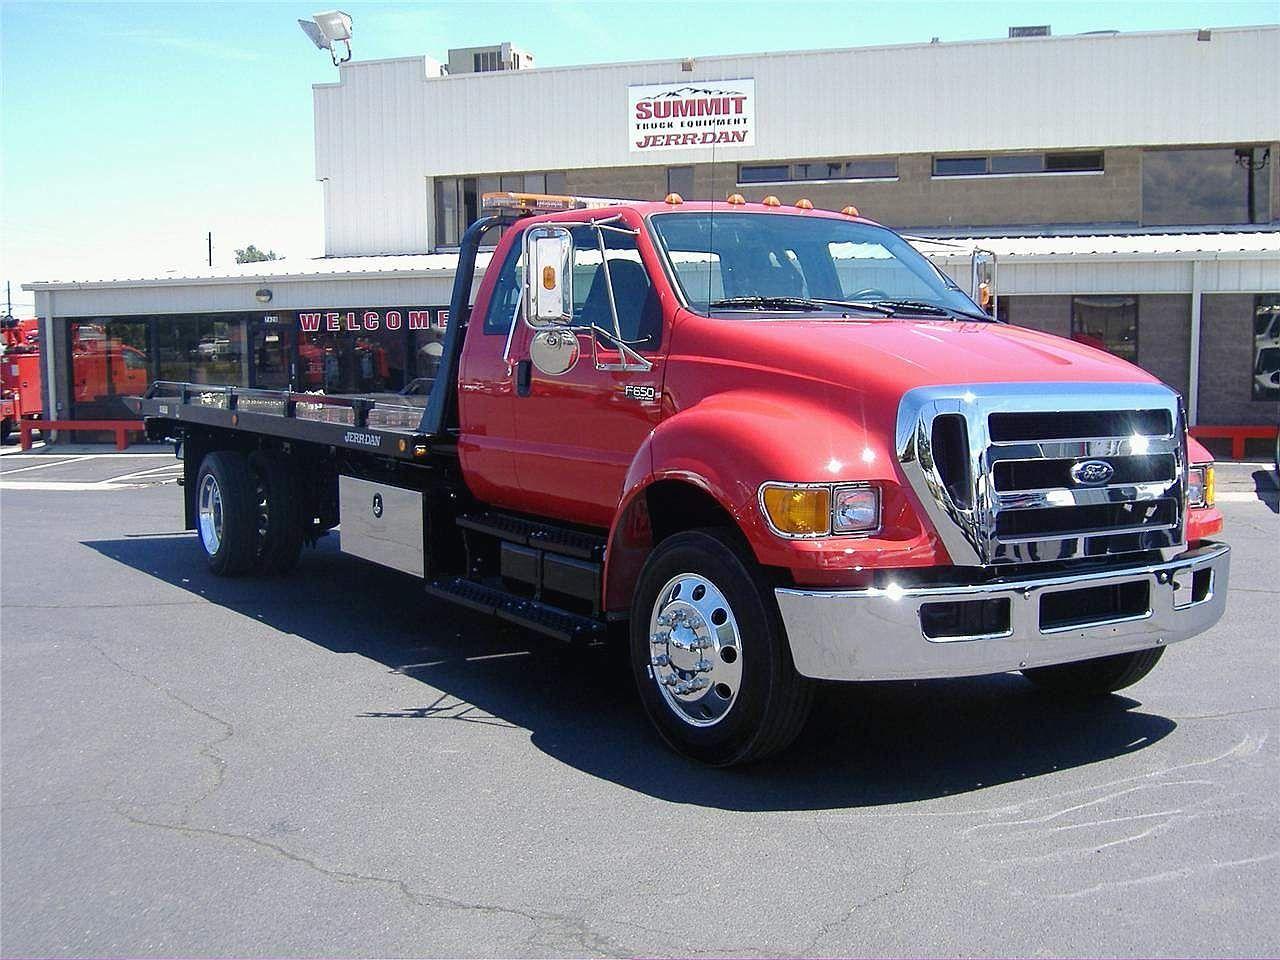 used flatbed pickup trucks for sale trucks newz tow trucks pinterest tow truck. Black Bedroom Furniture Sets. Home Design Ideas